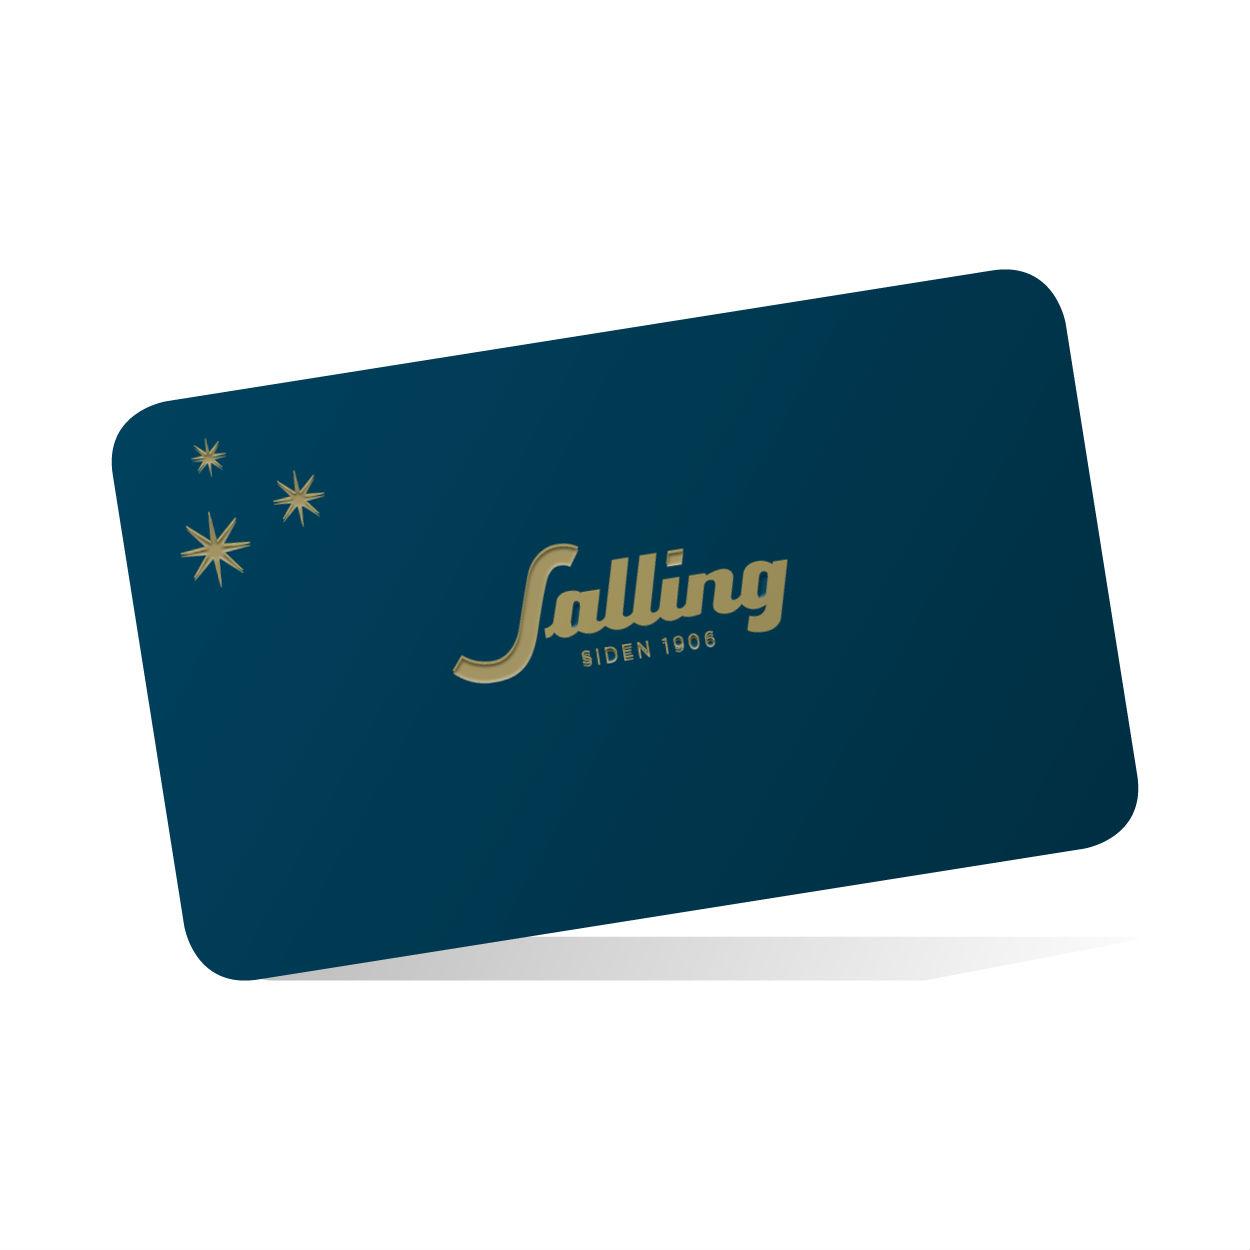 Salling gavekort - 950 kr